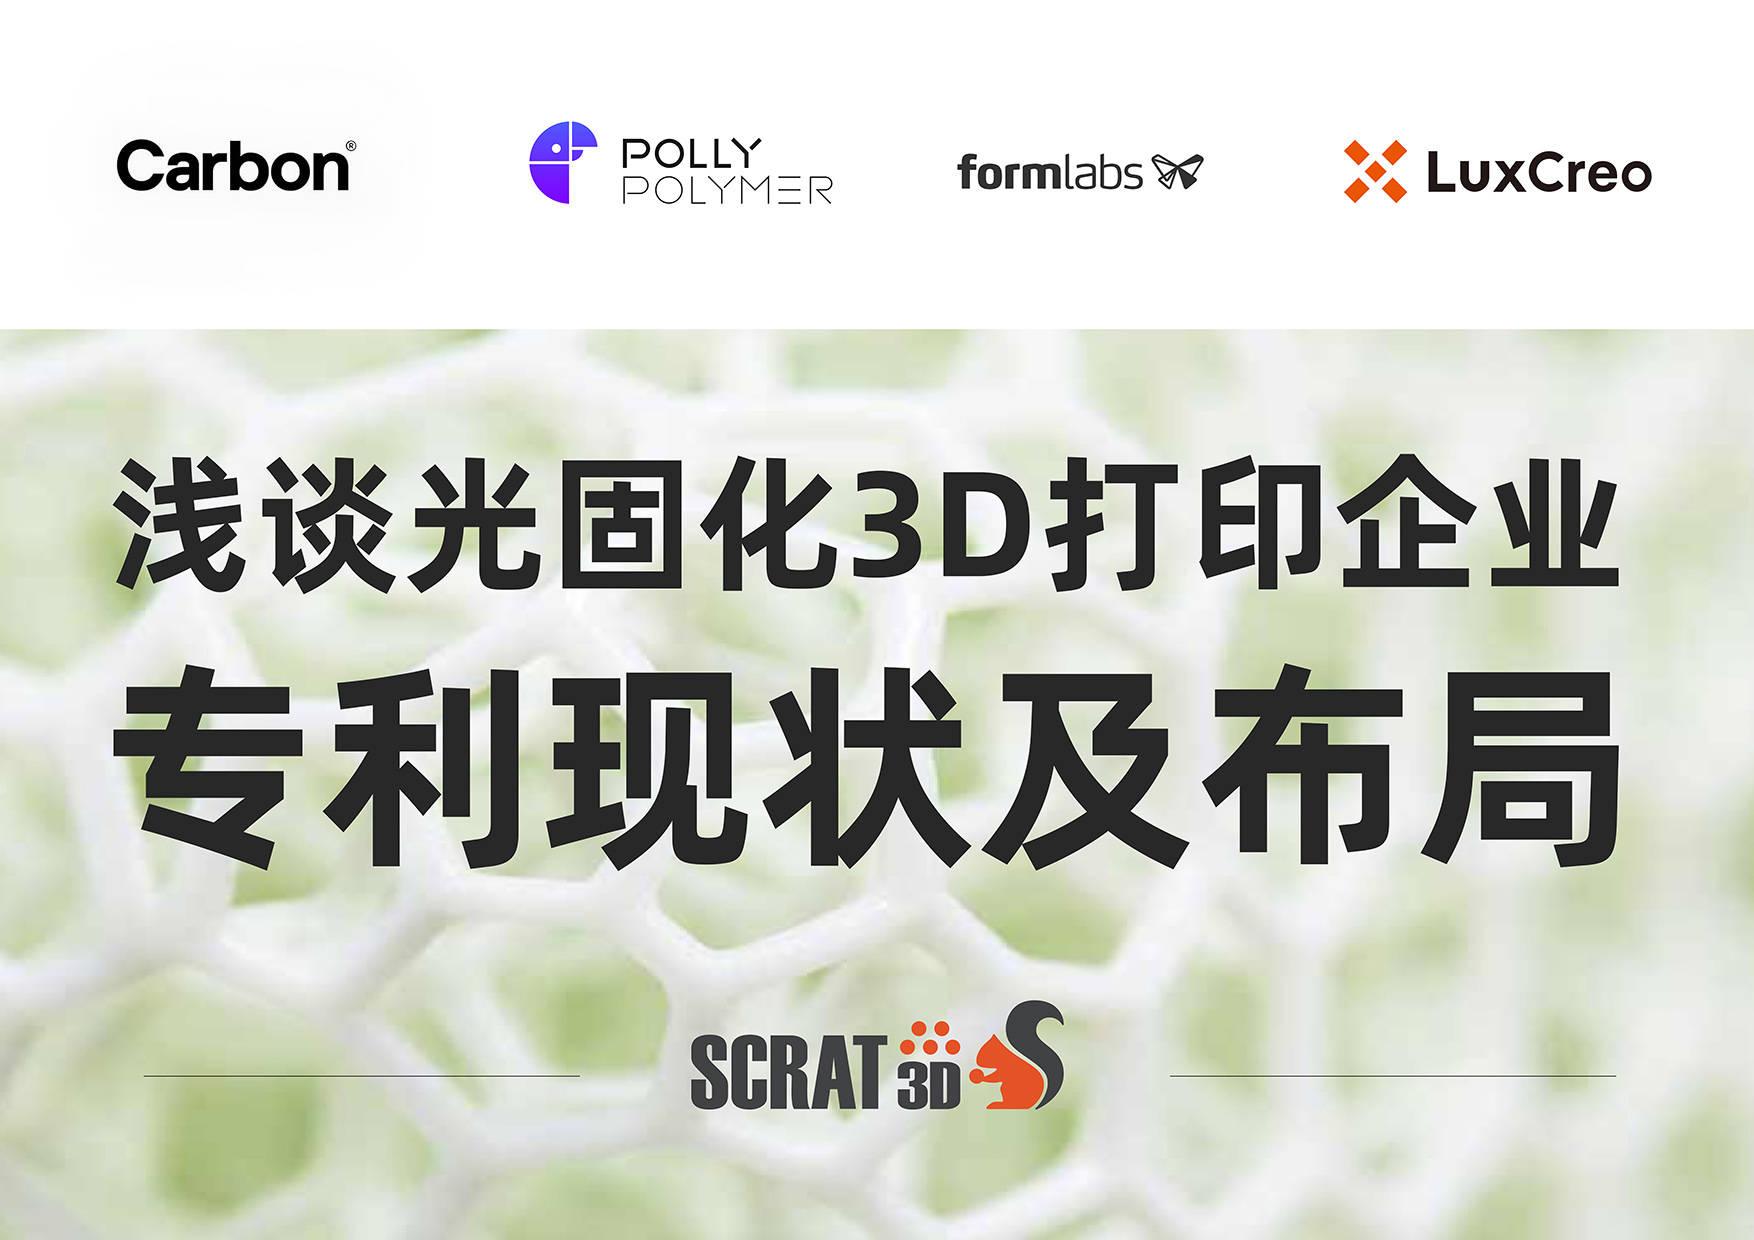 SCRAT3D 浅谈中美光固化3D打印企业专利现状及布局对比